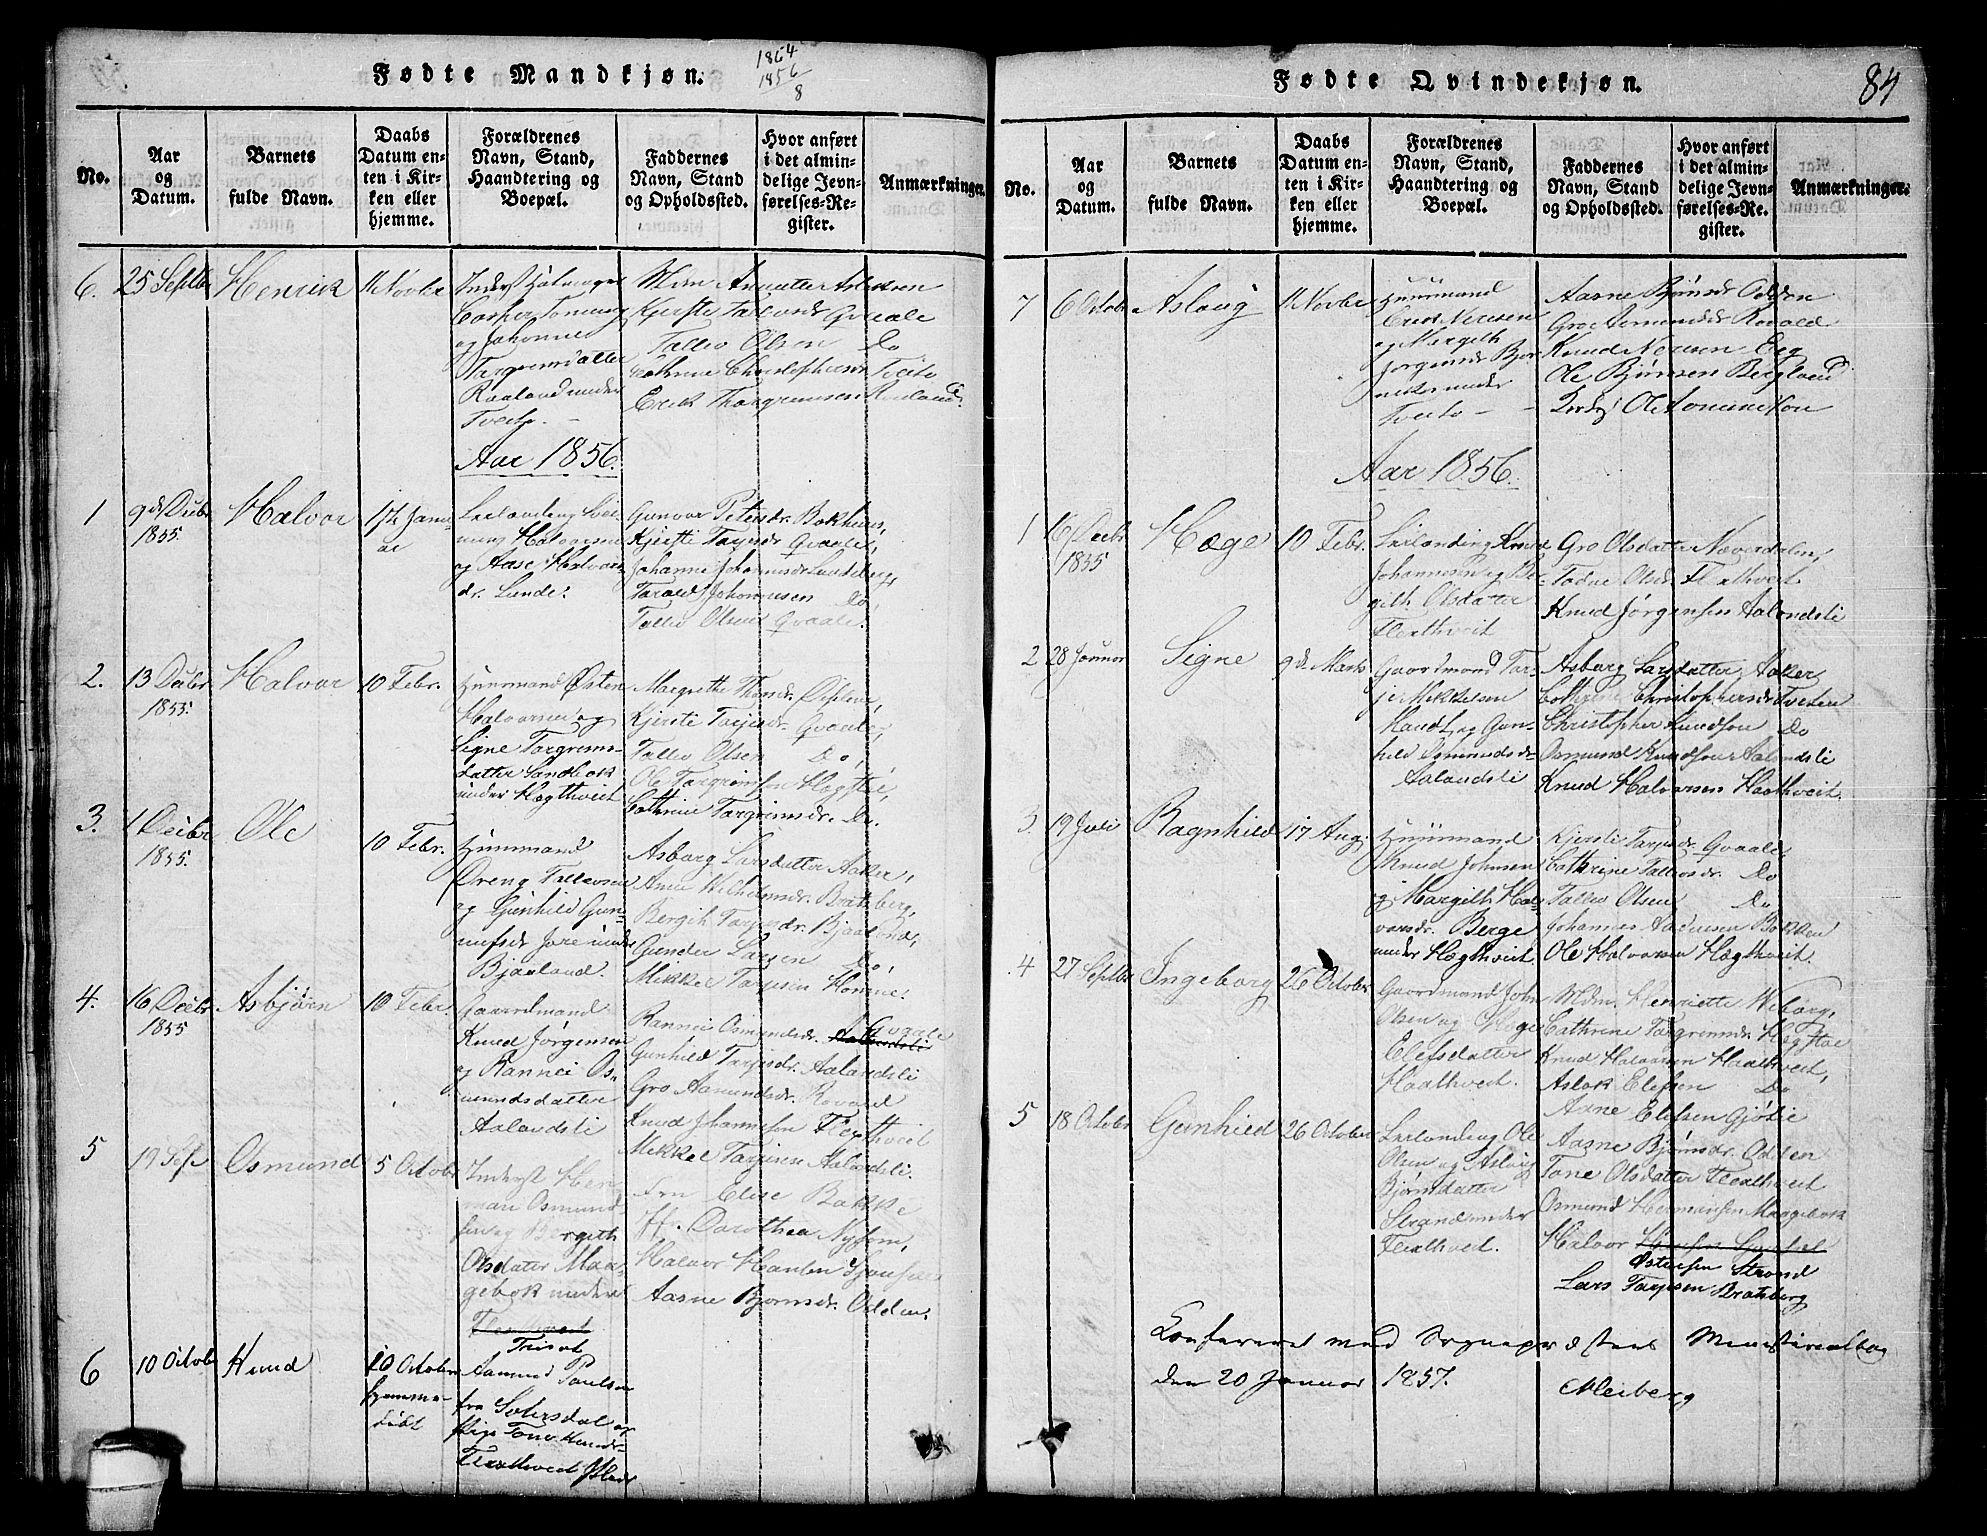 SAKO, Lårdal kirkebøker, G/Ga/L0001: Klokkerbok nr. I 1, 1815-1861, s. 84